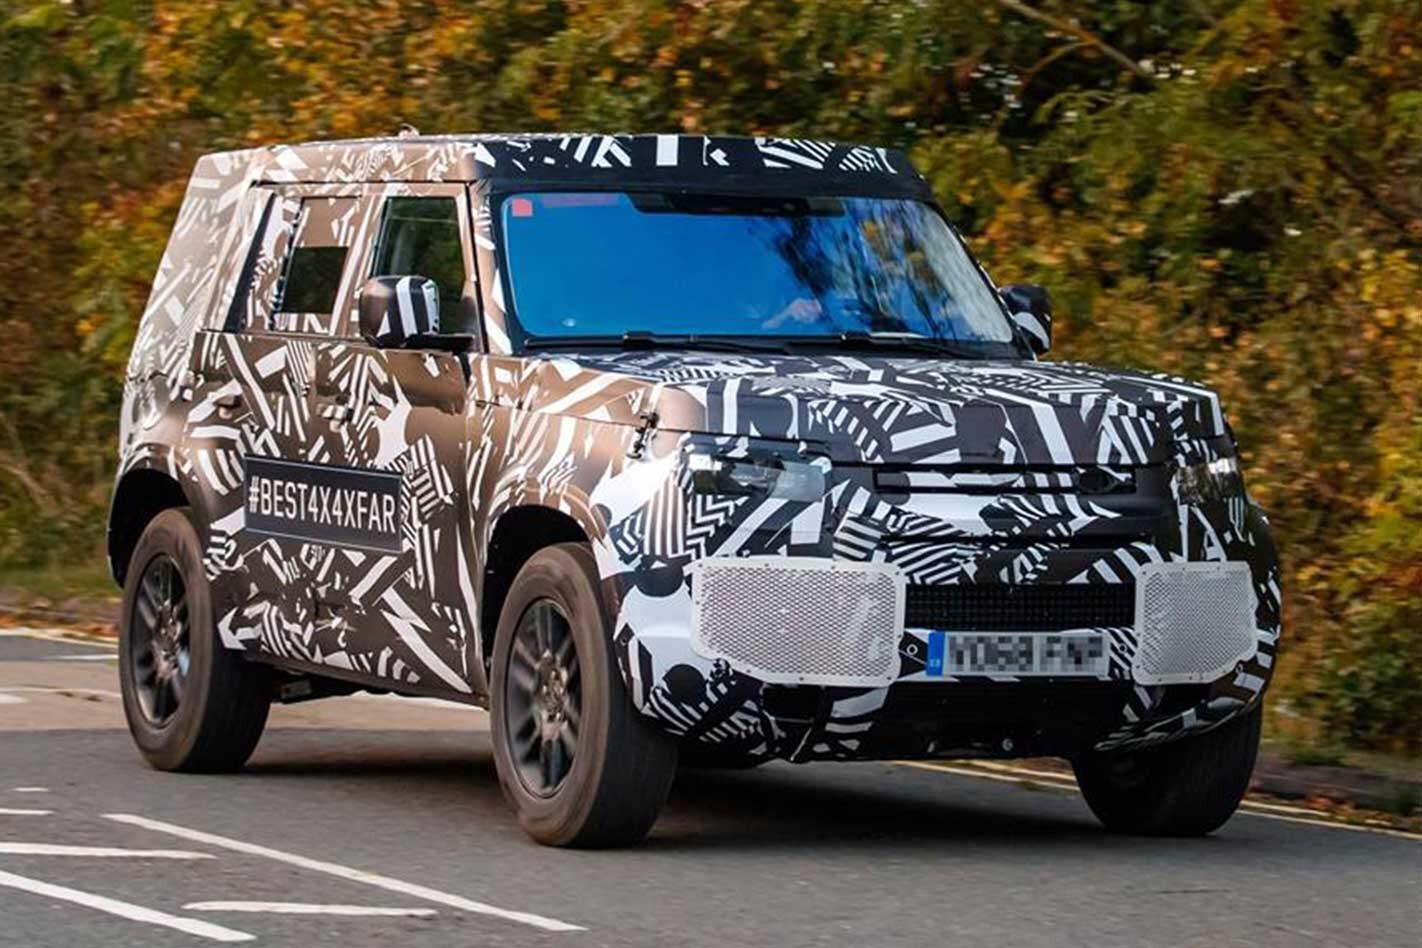 2020 Land Rover Defender Camo Front Jpg